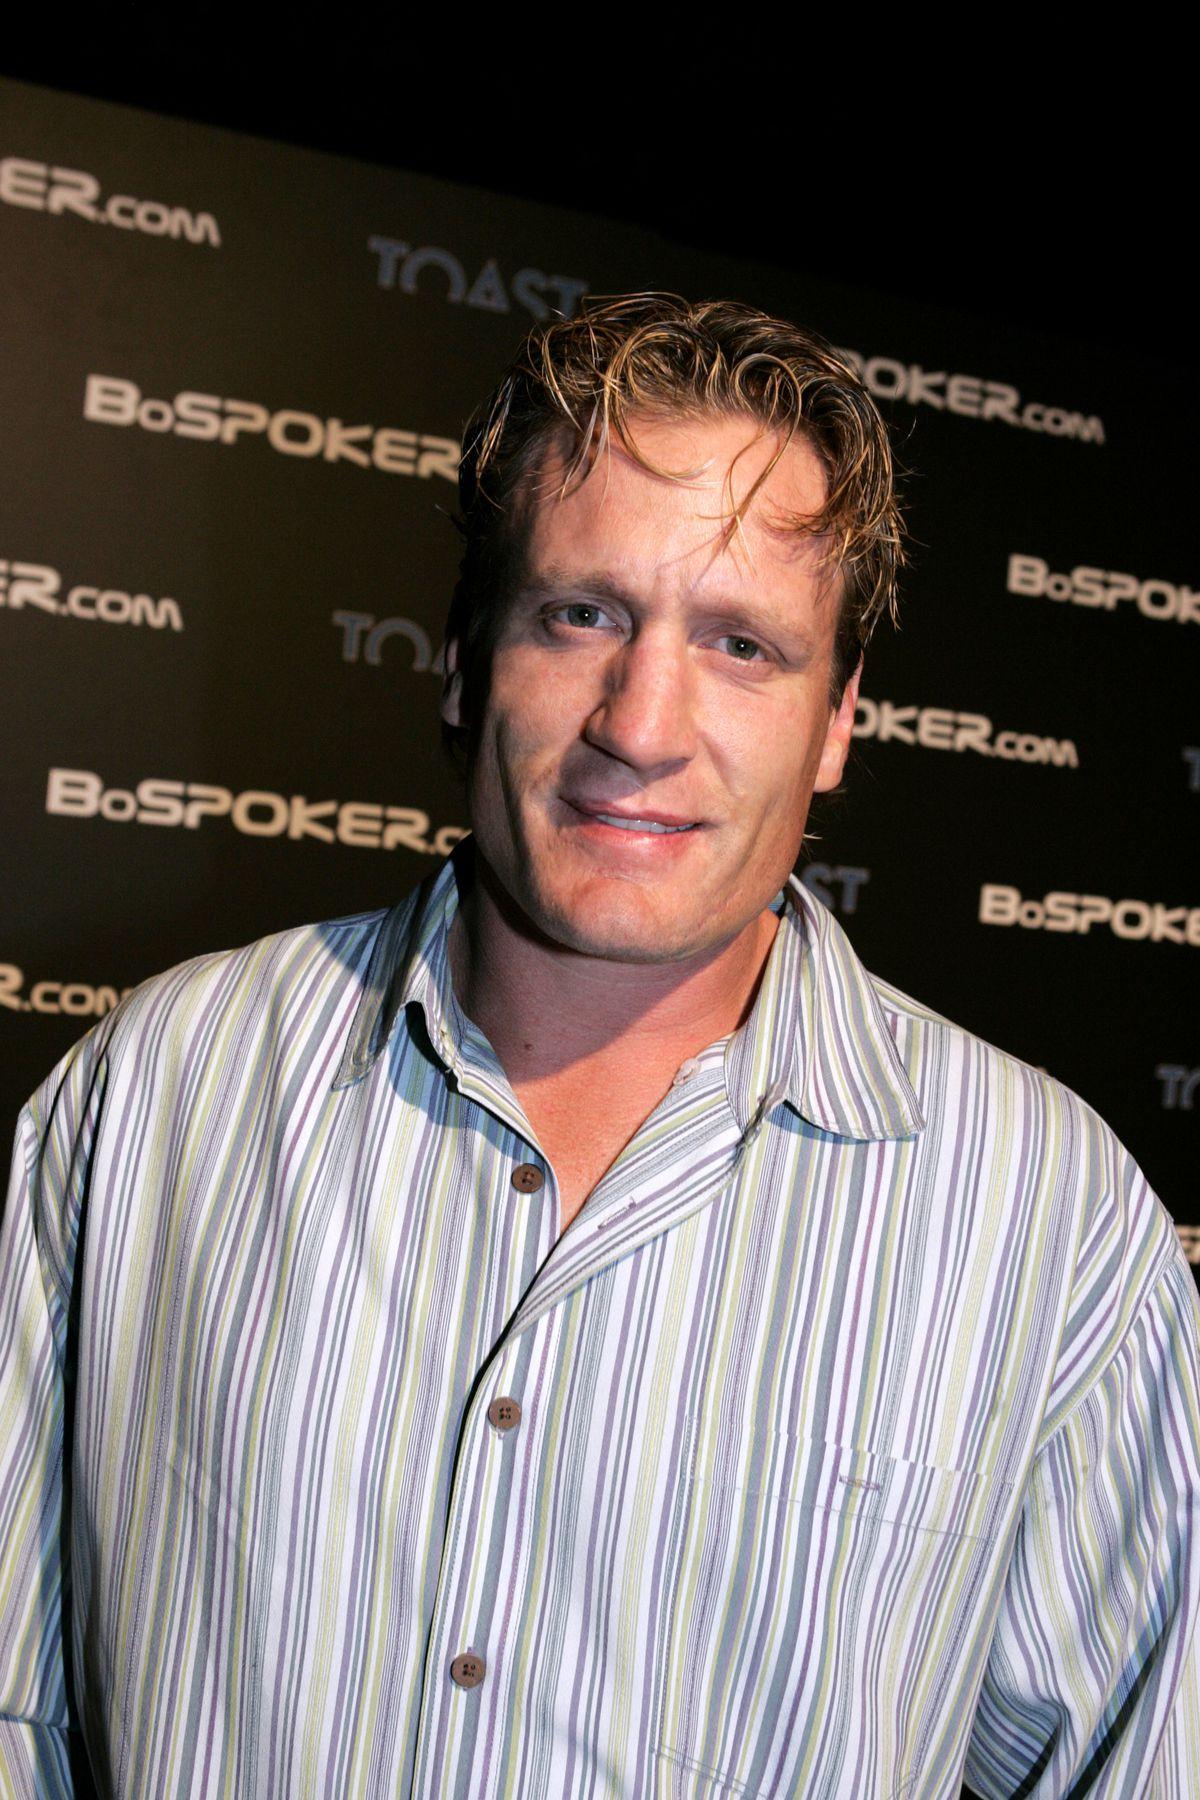 BosPoker.com 2004 Celebrity Poker Tournament - Inside